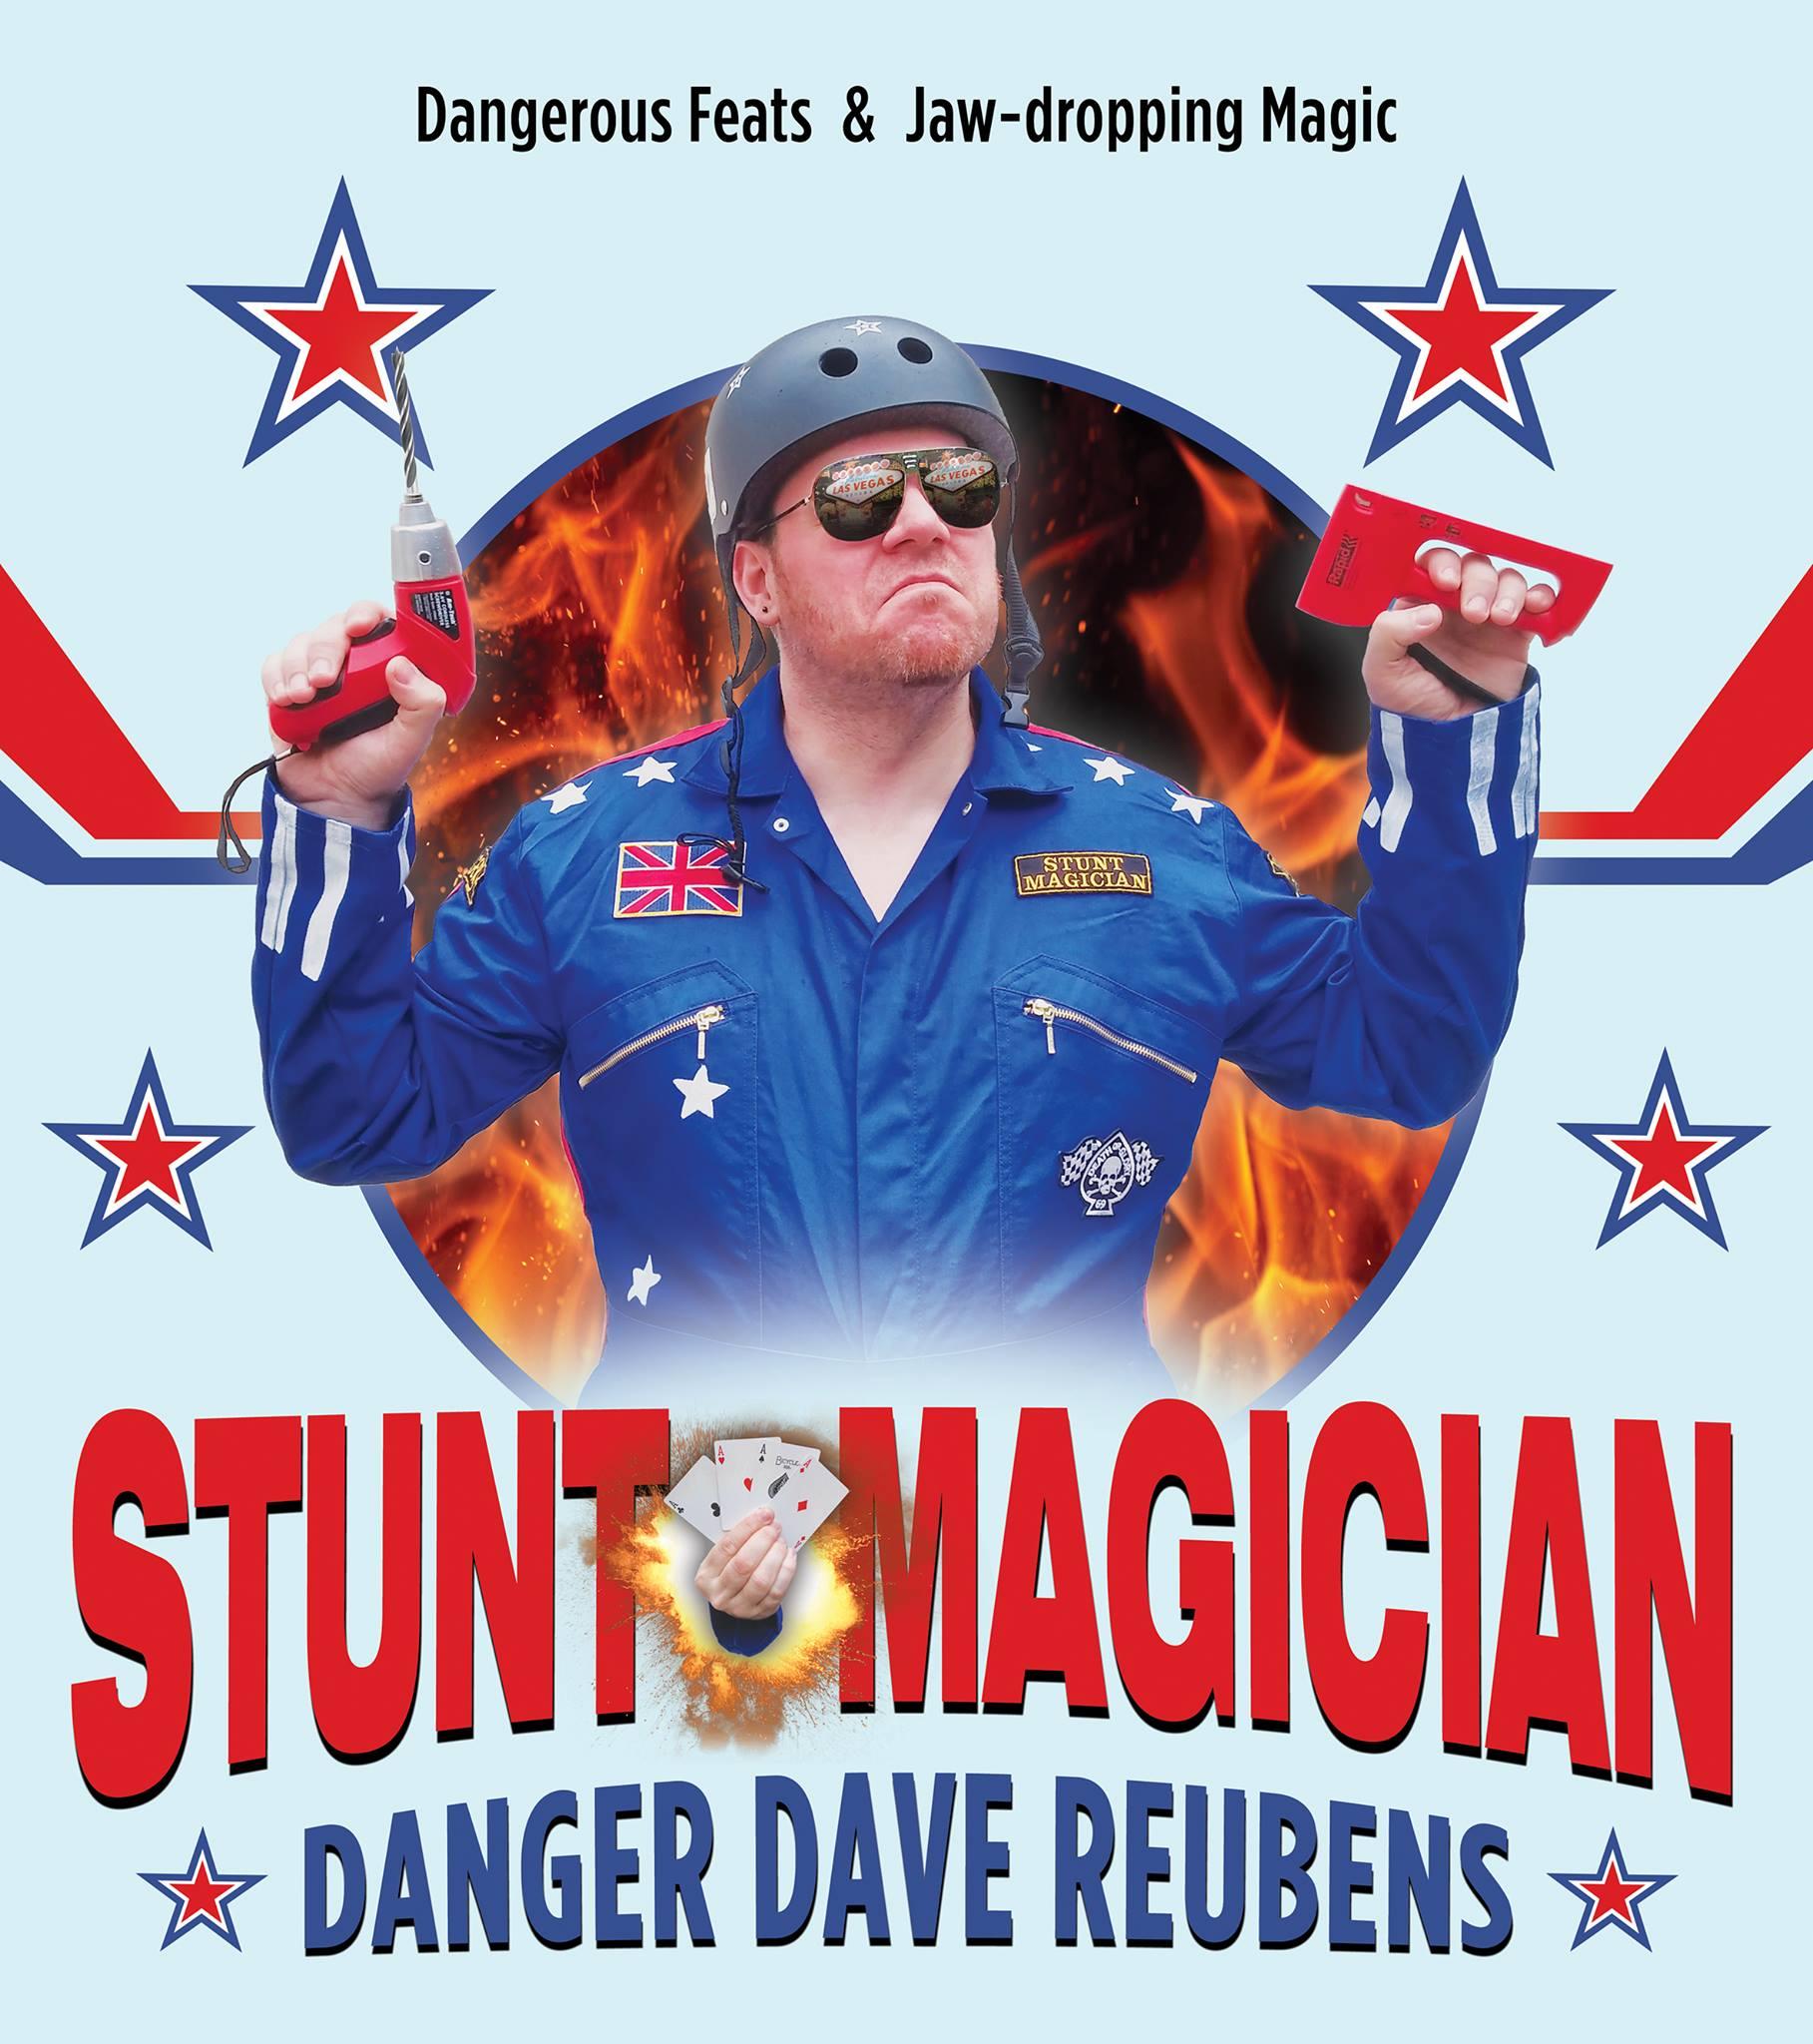 Danger Dave Reubens - Stunt Magician